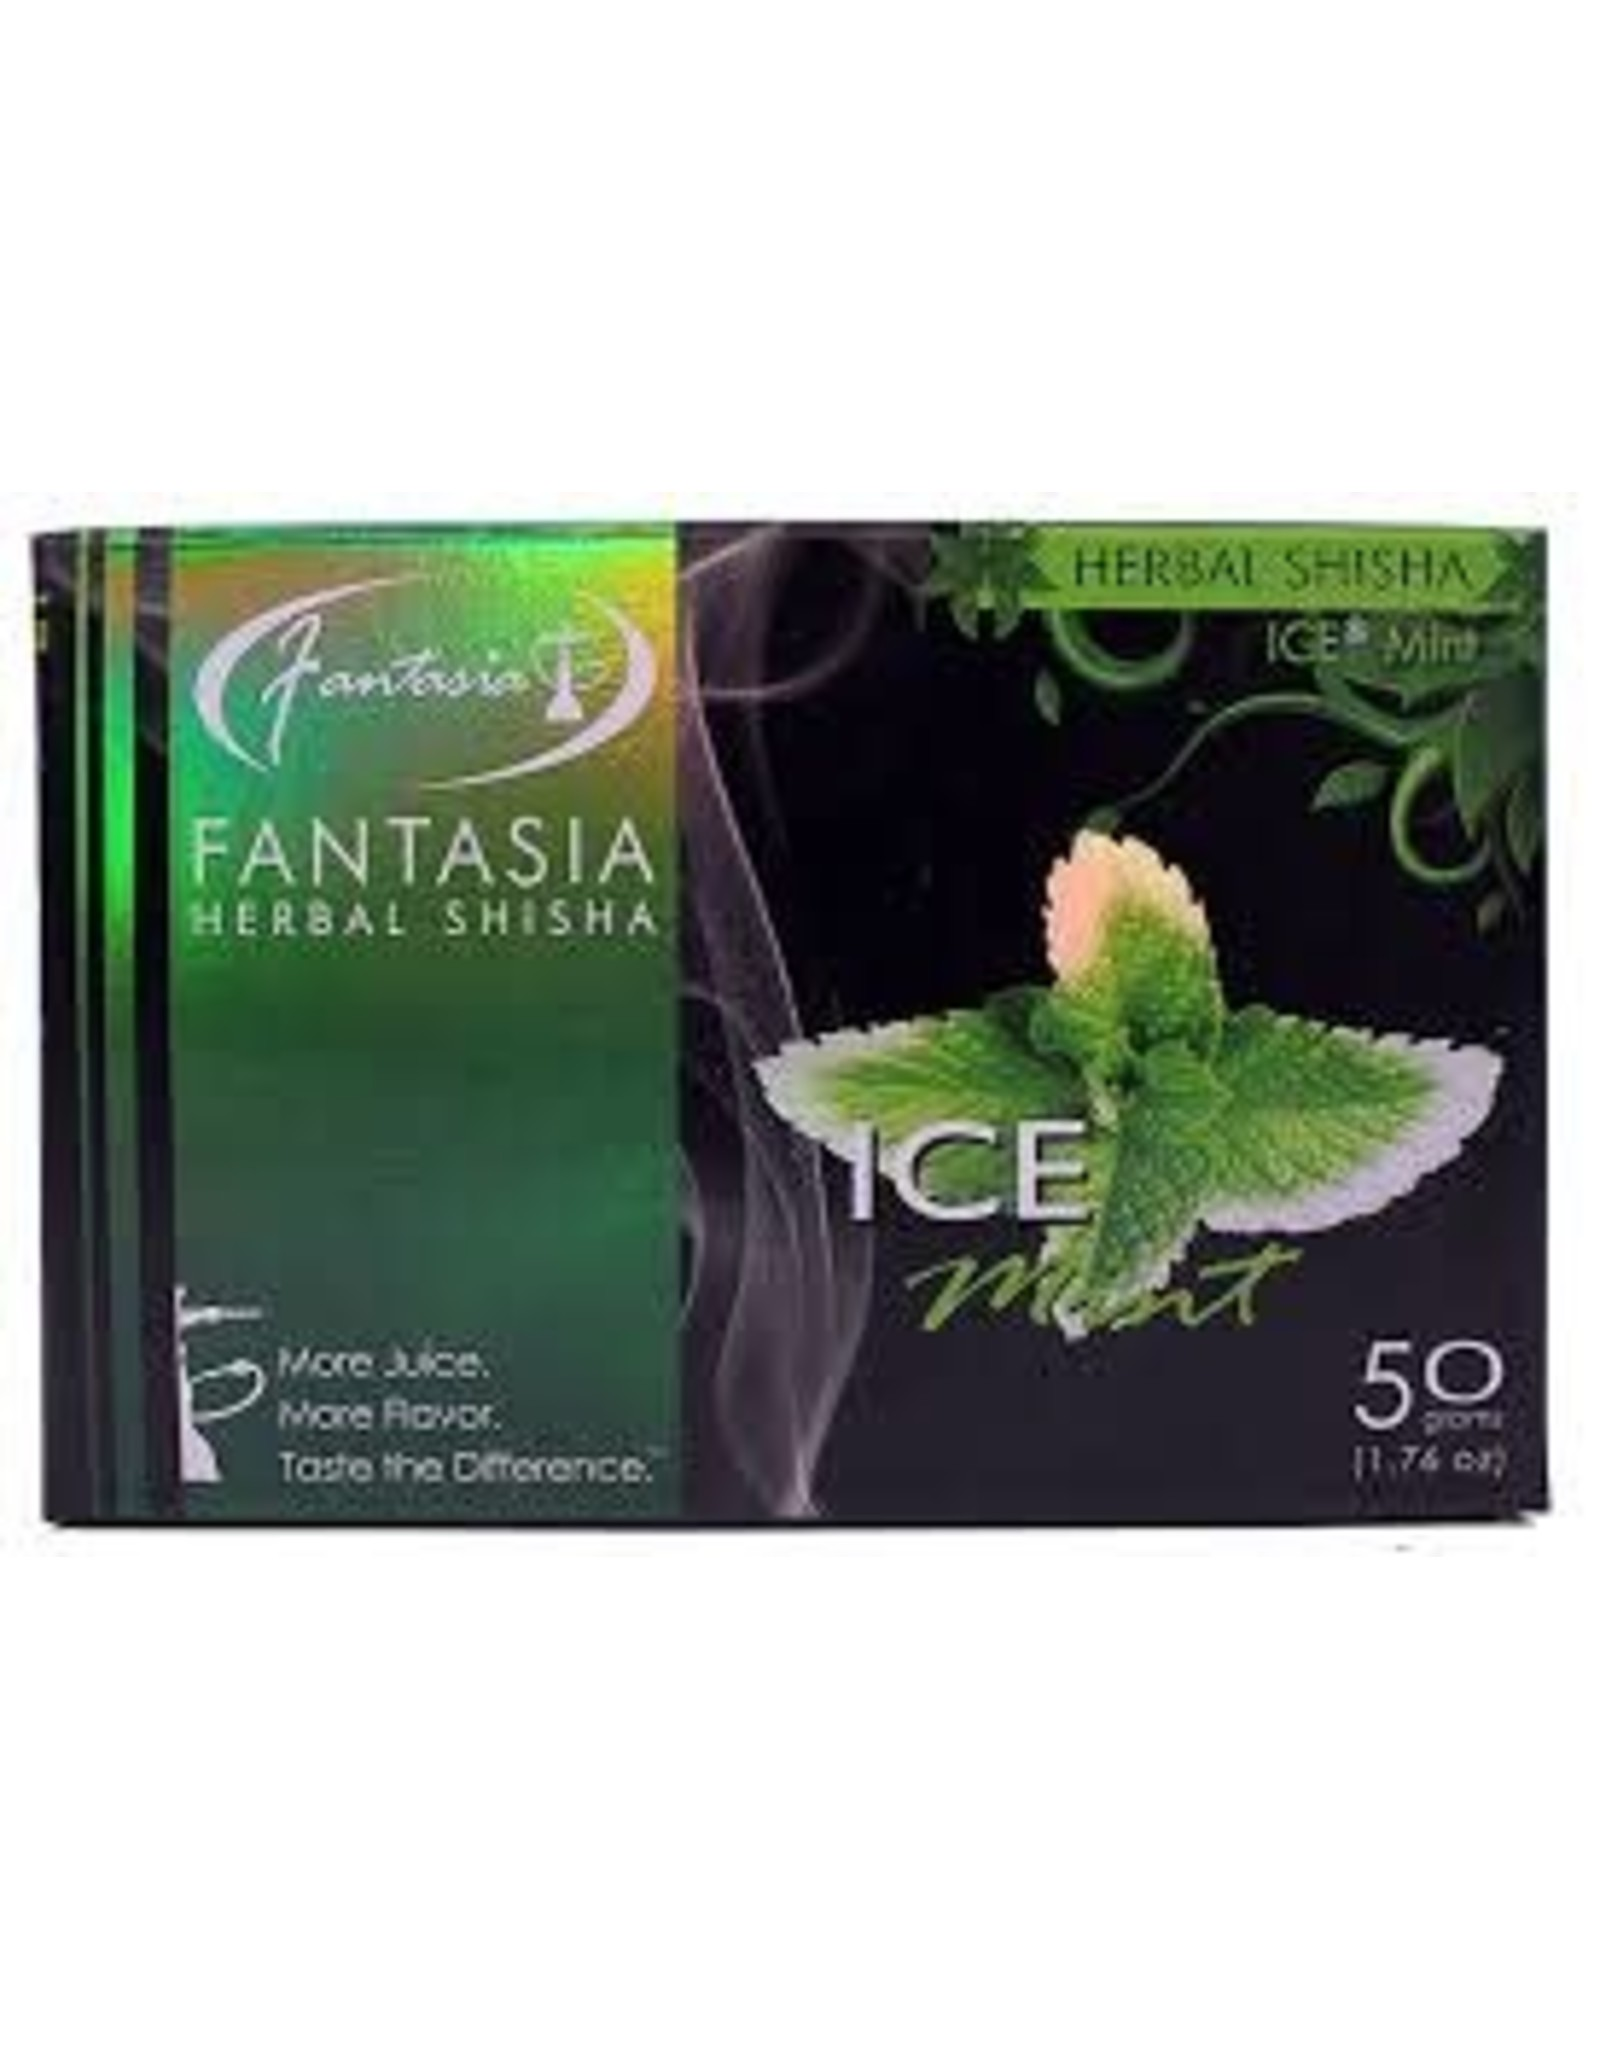 50g Fantasia Herbal Shisha Ice Mint